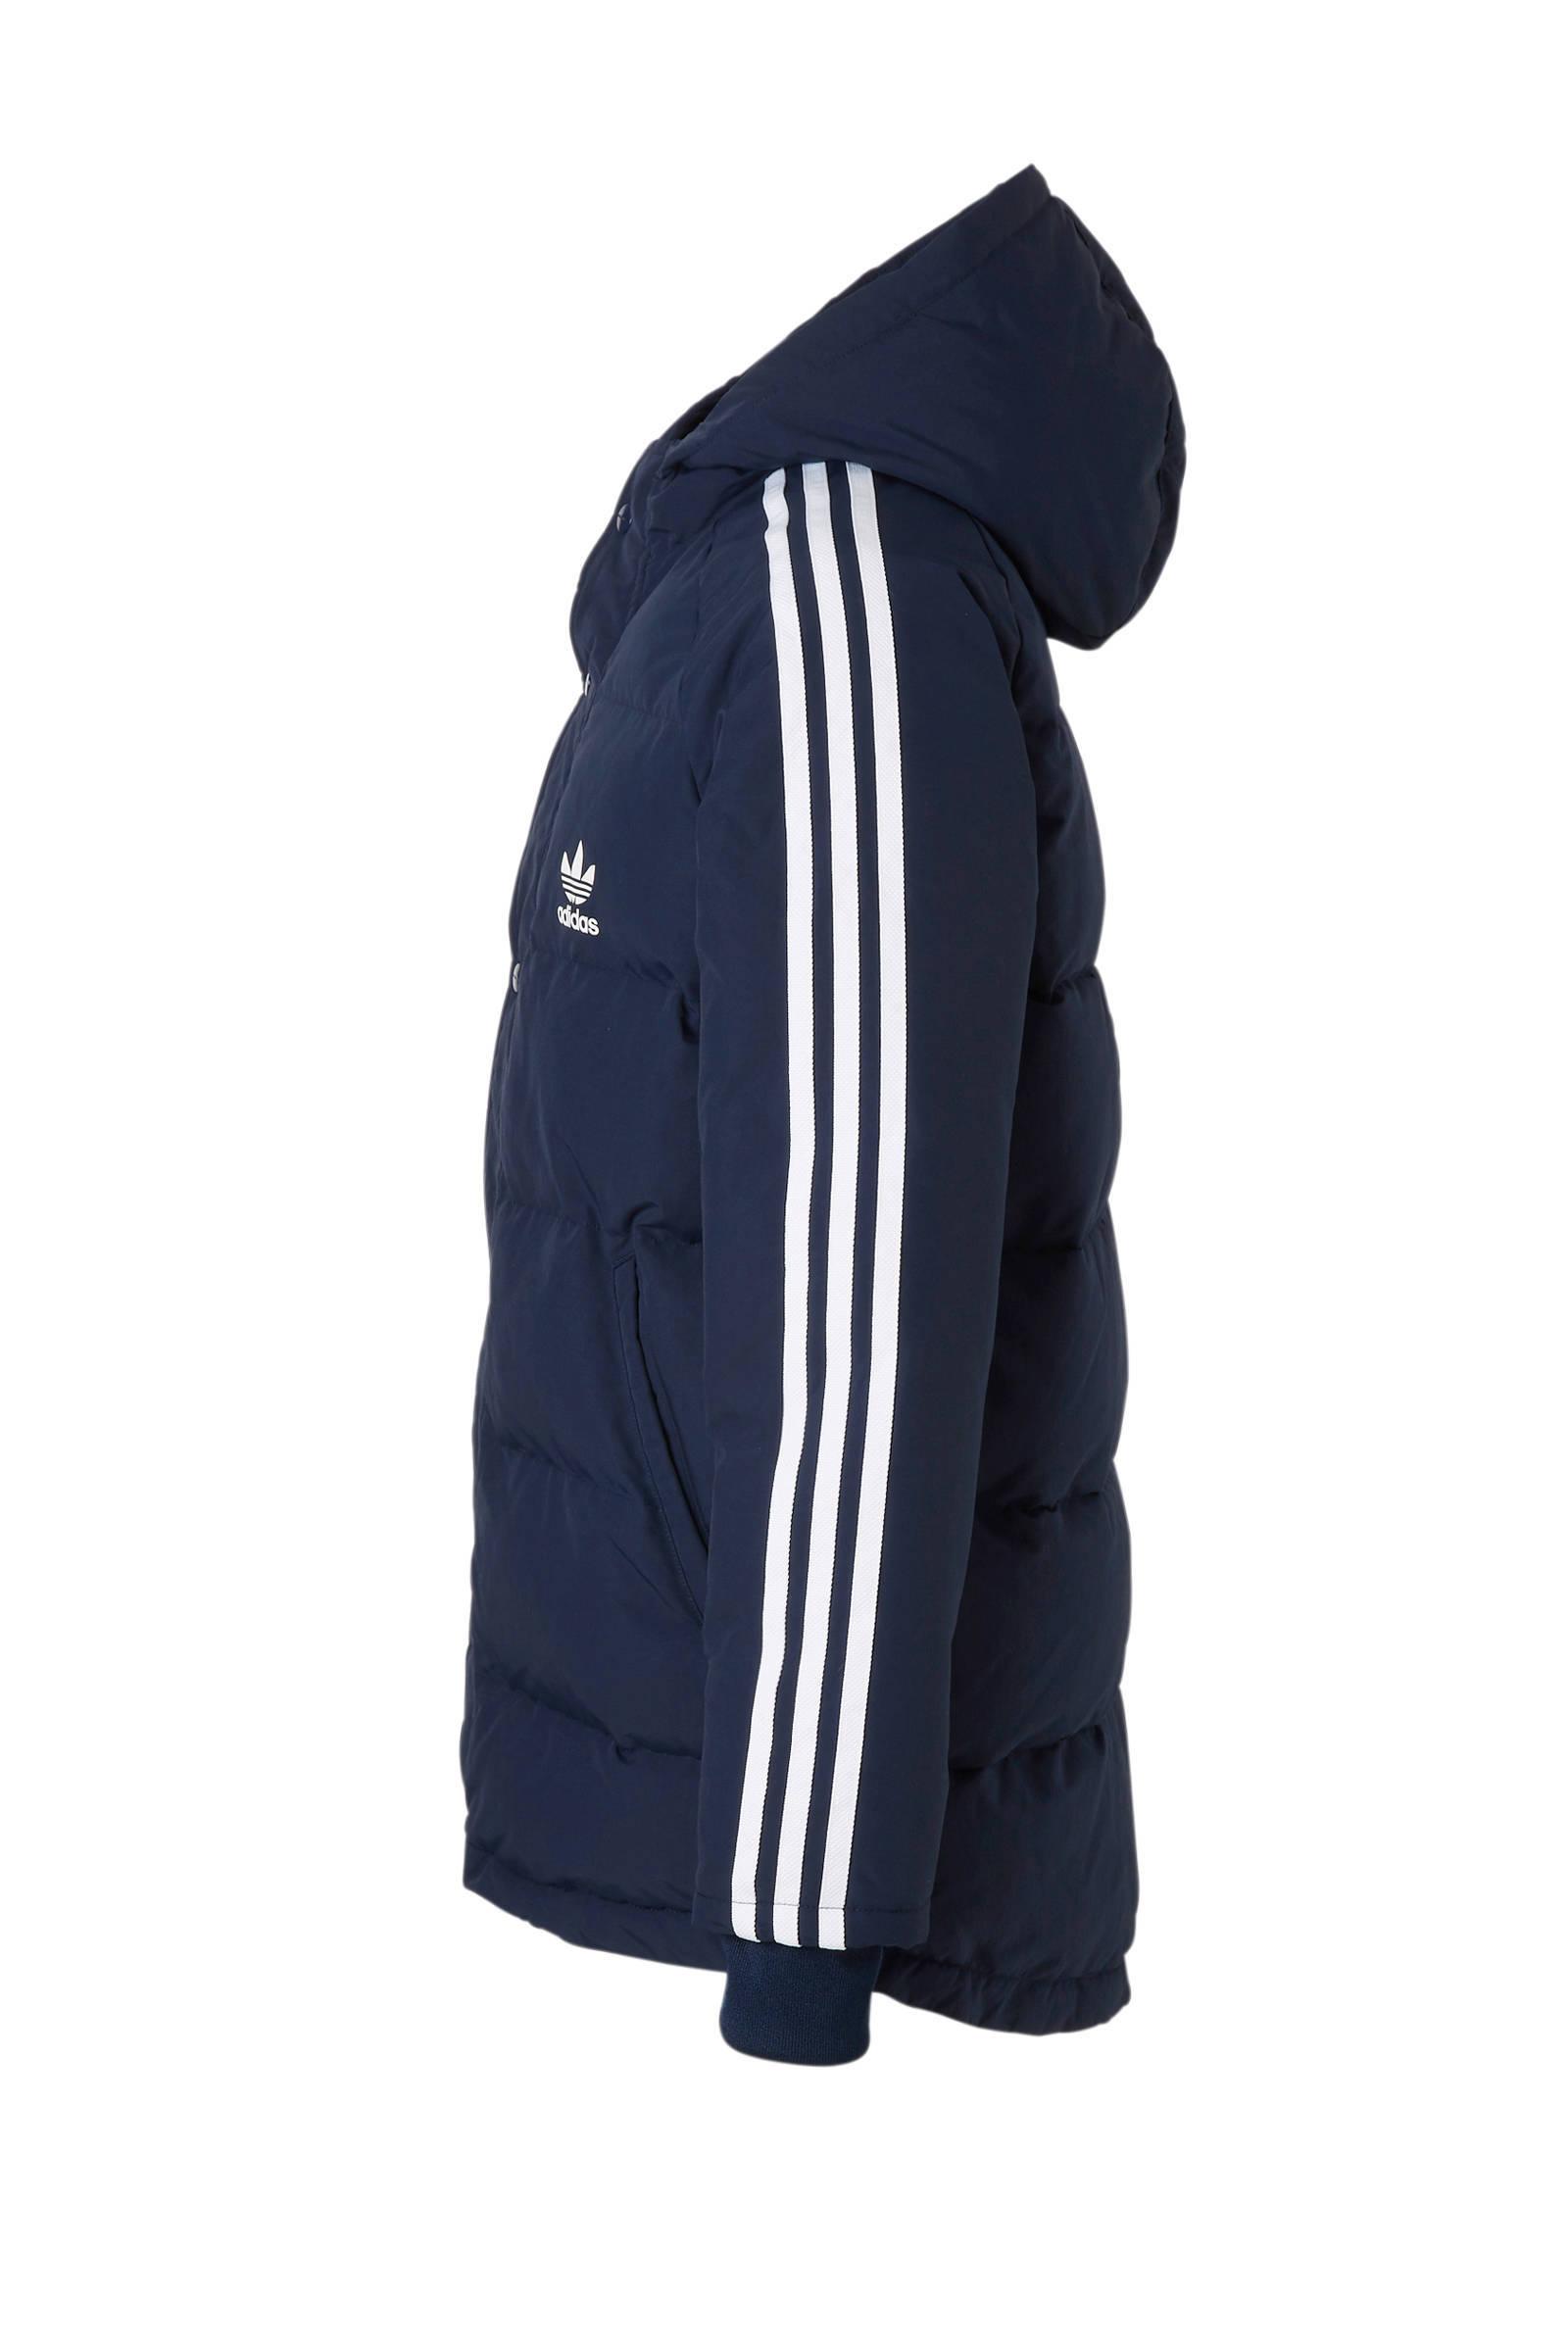 adidas Originals winterjas donkerblauw | wehkamp